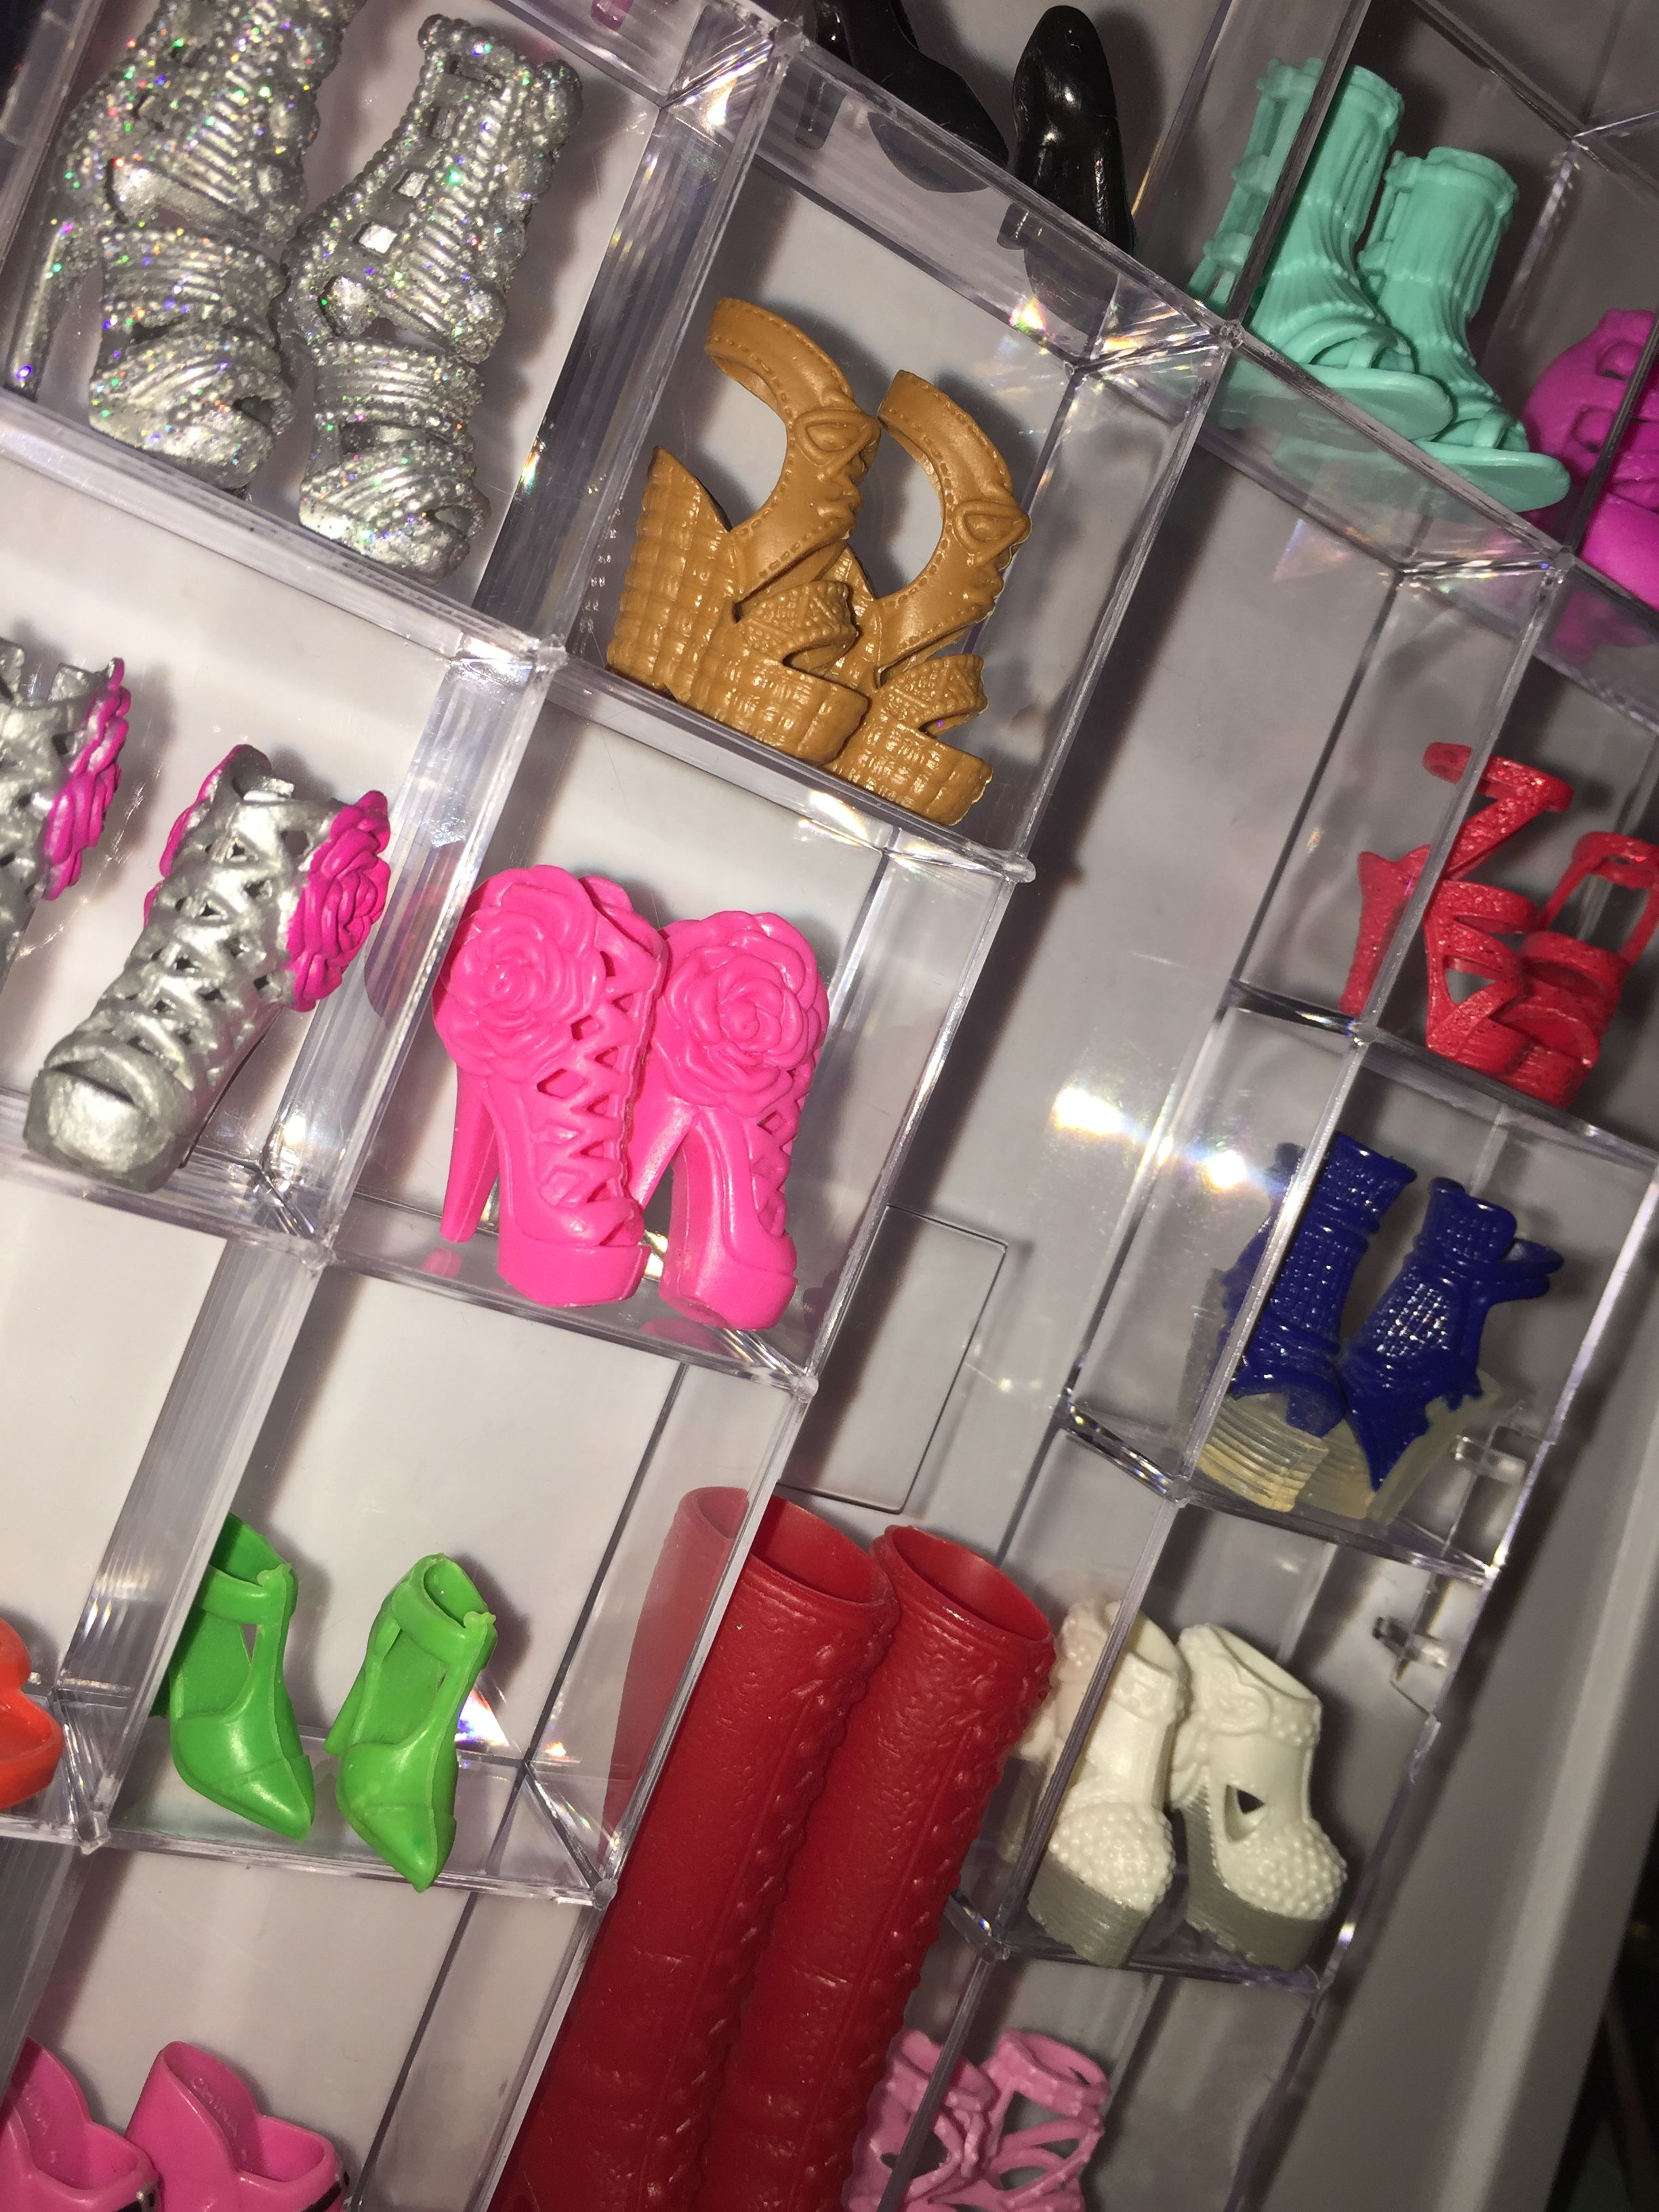 Diy Barbie shoe (With images) Shoe rack